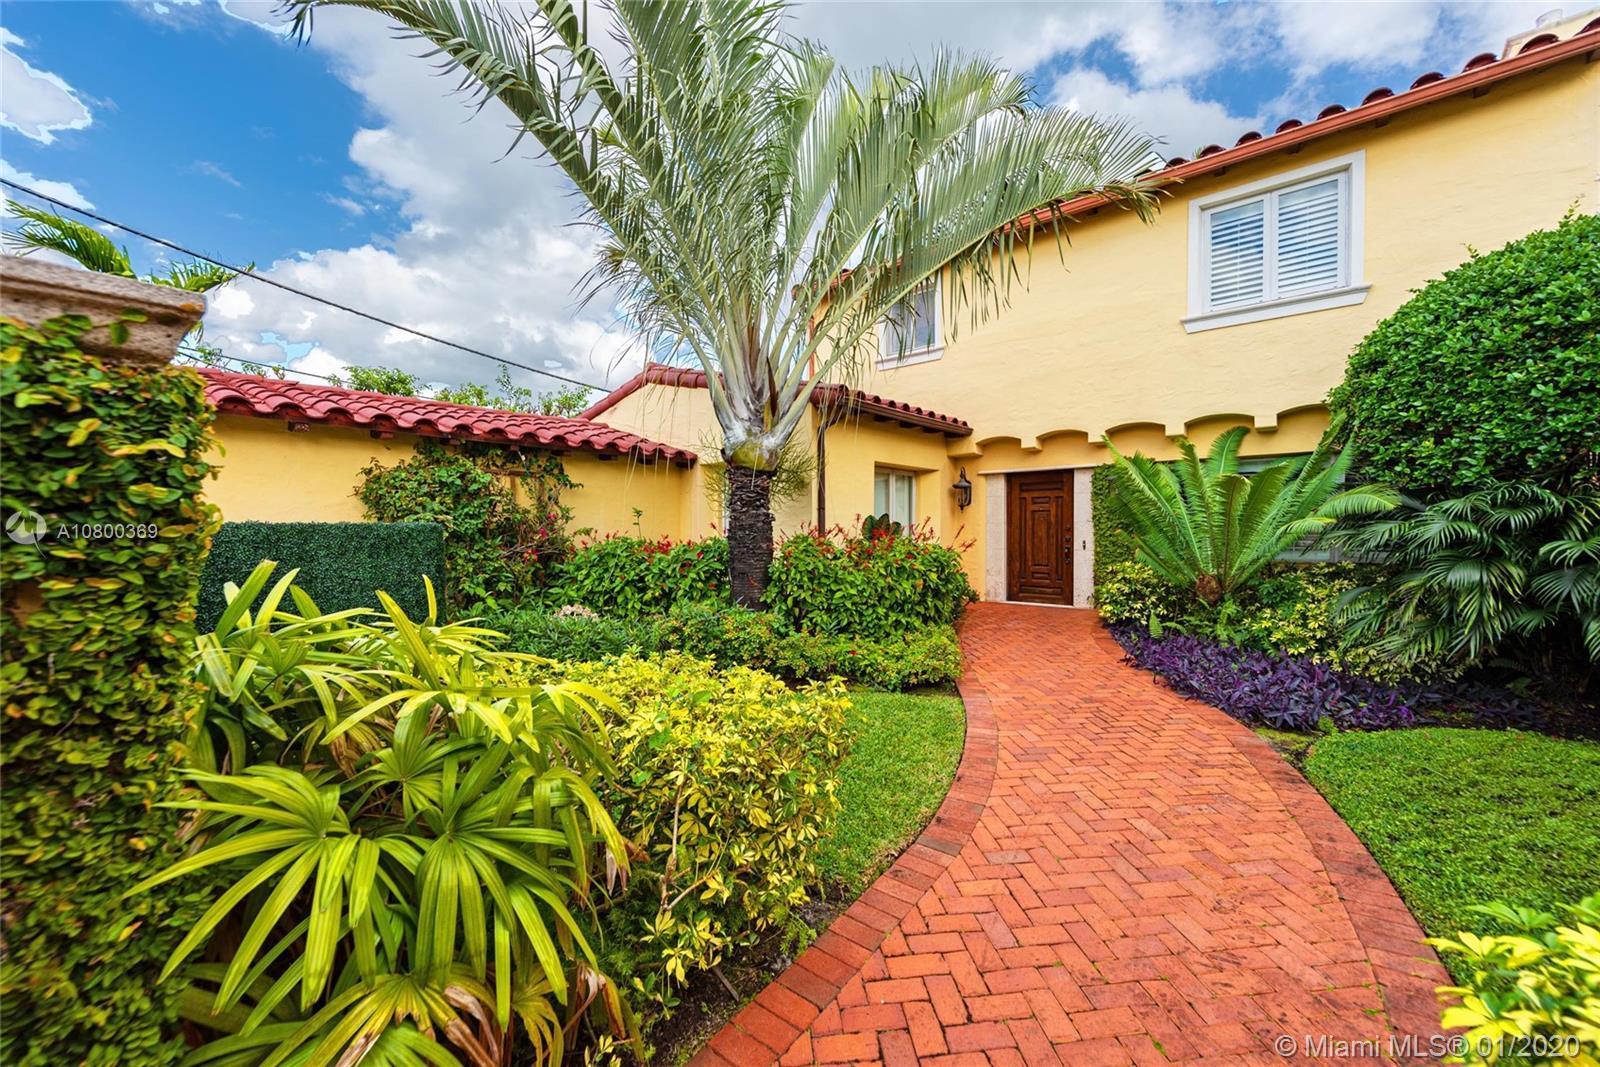 This wonderful 3 bedroom, 4 bath pool home located on prestigious upper North Bay Road boasts grand